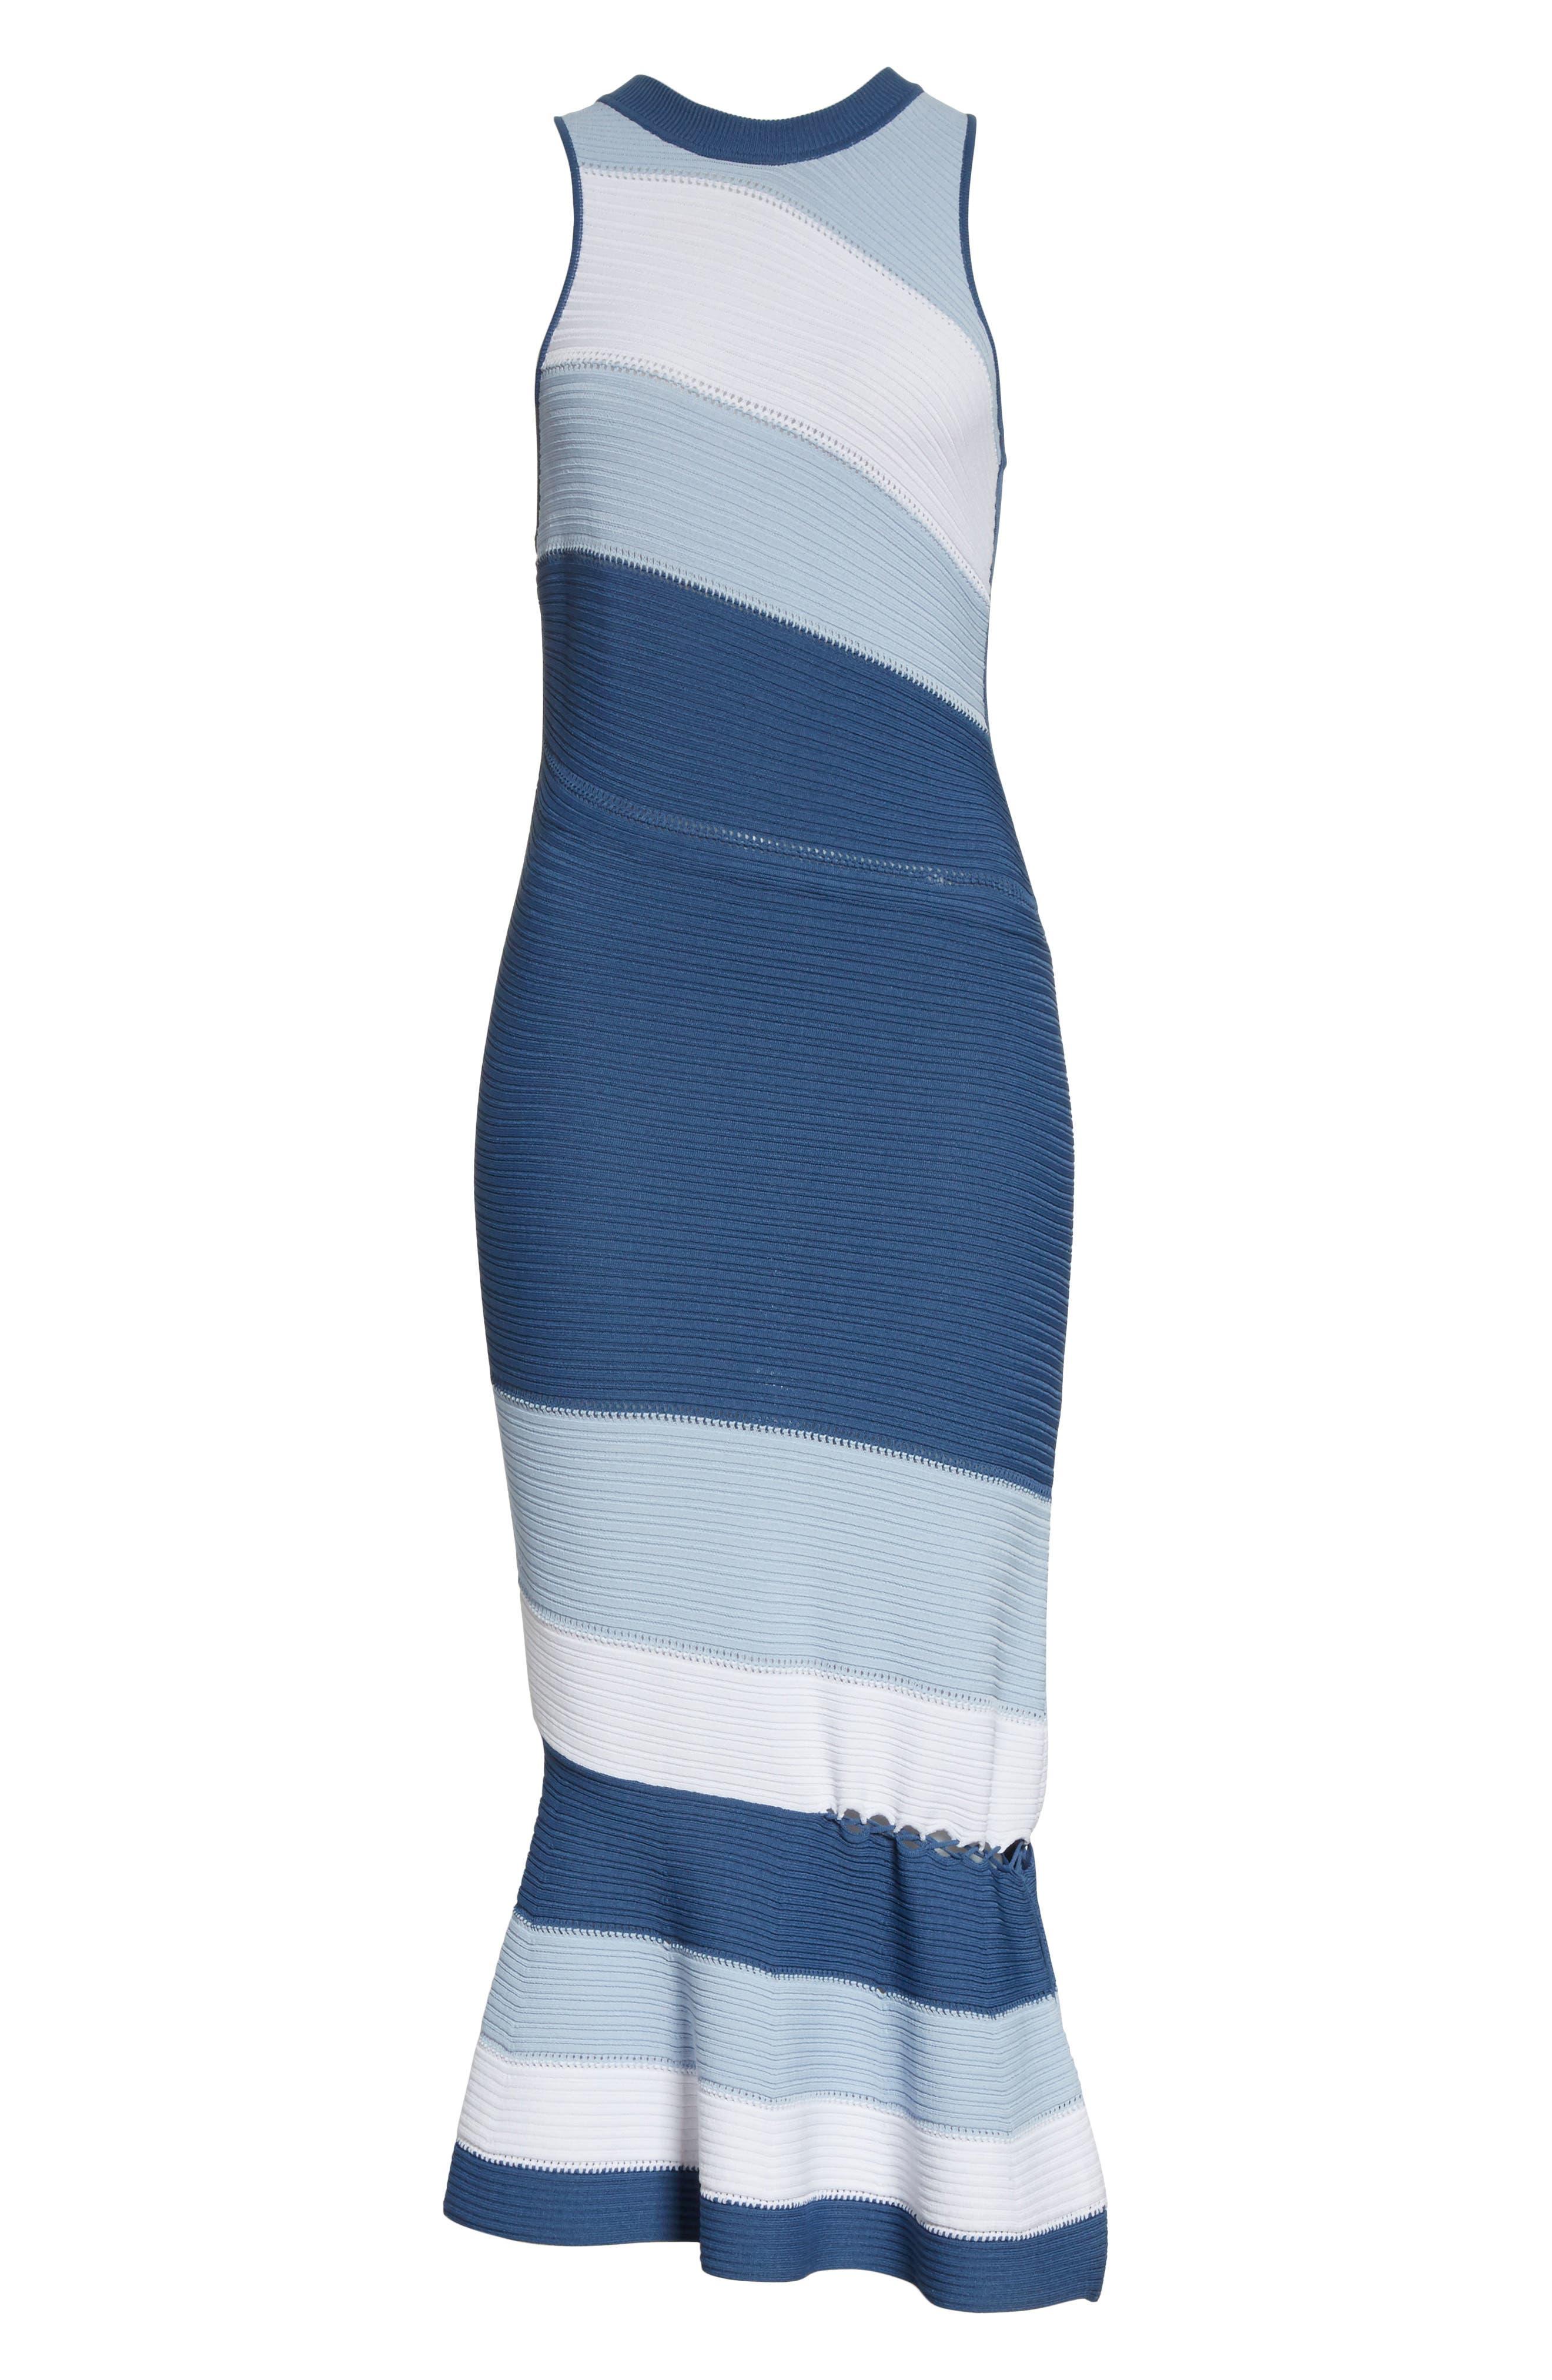 Linked Asymmetrical Dress,                             Alternate thumbnail 6, color,                             Blue Combo